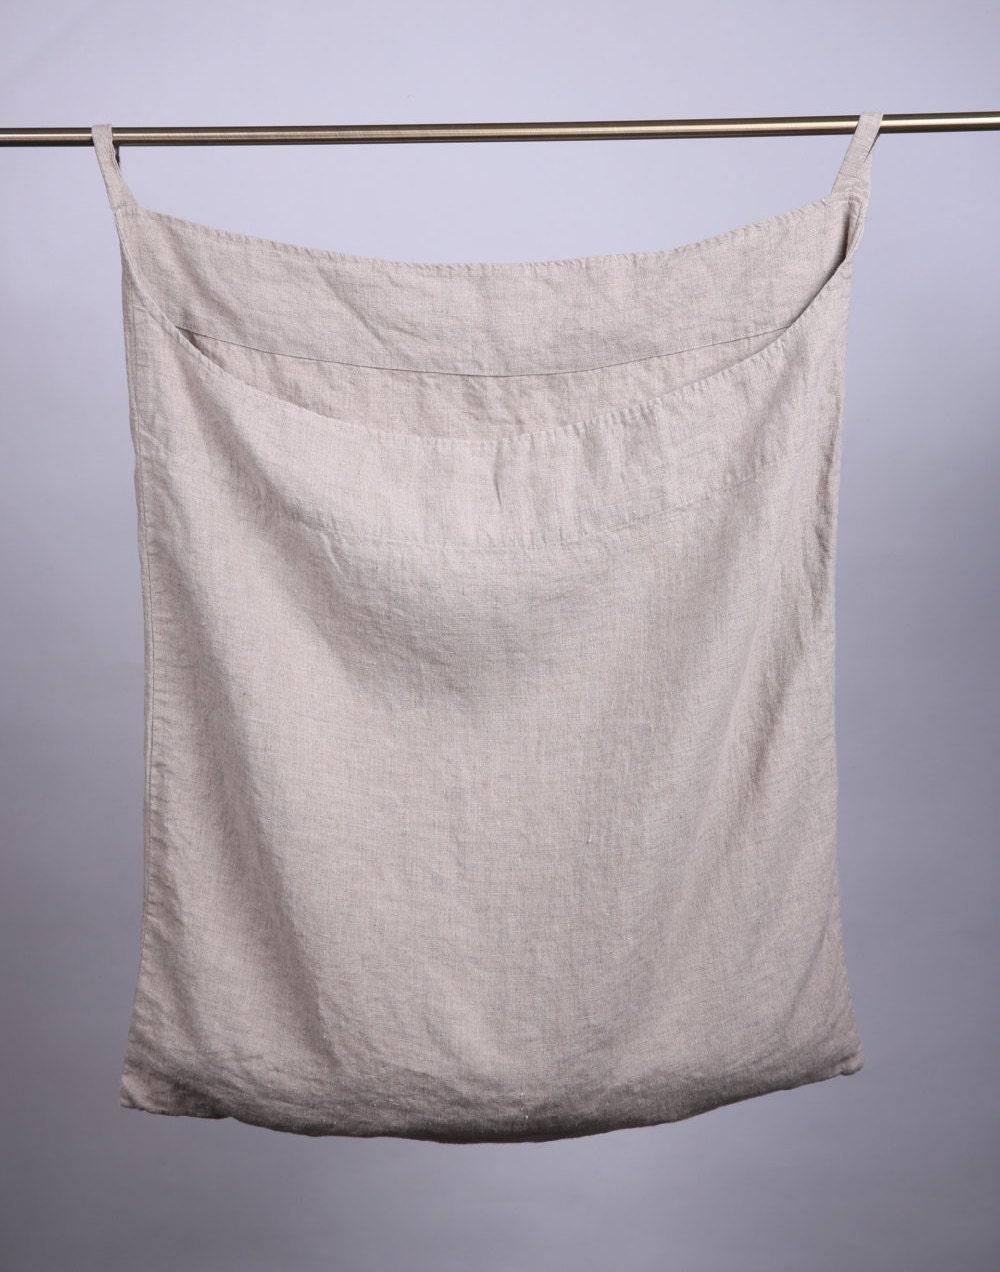 Linen Laundry Bag Linen Bag Hanging Laundry Bag Wall